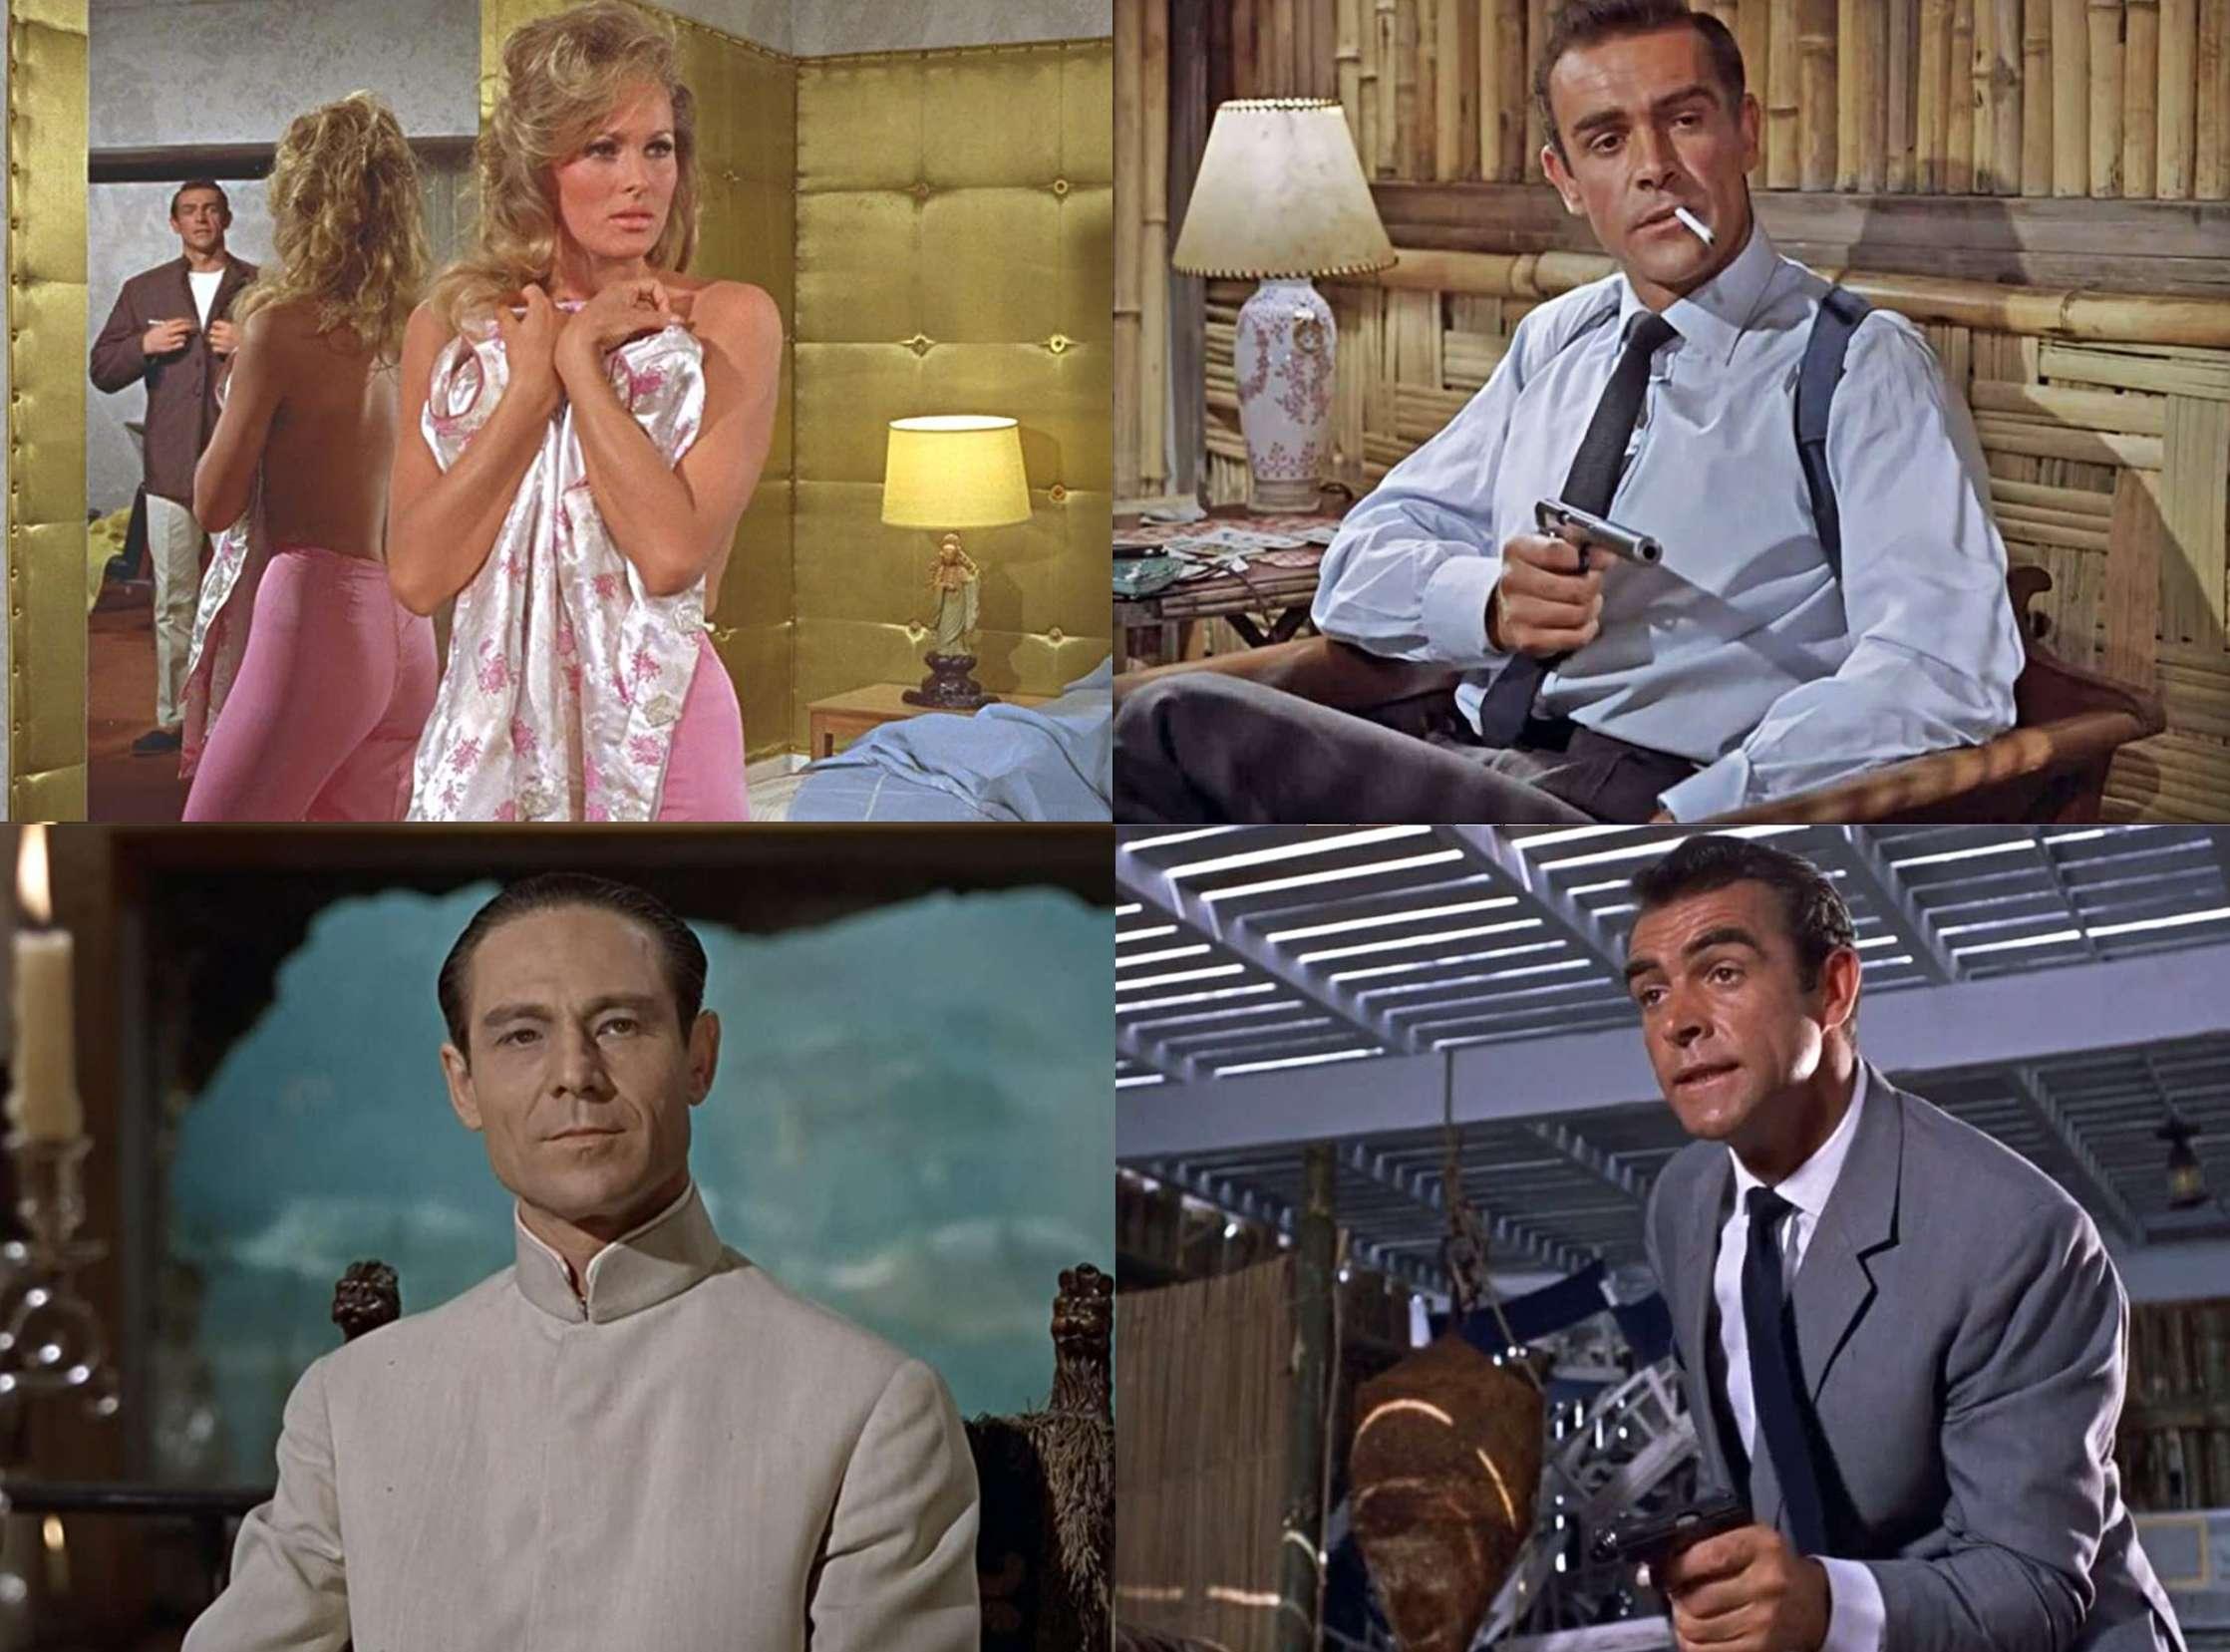 Sean Connery Σον Κόνερι Ursula Andress Ούρσουλα Άντρες 007 J Bond Doctor NO